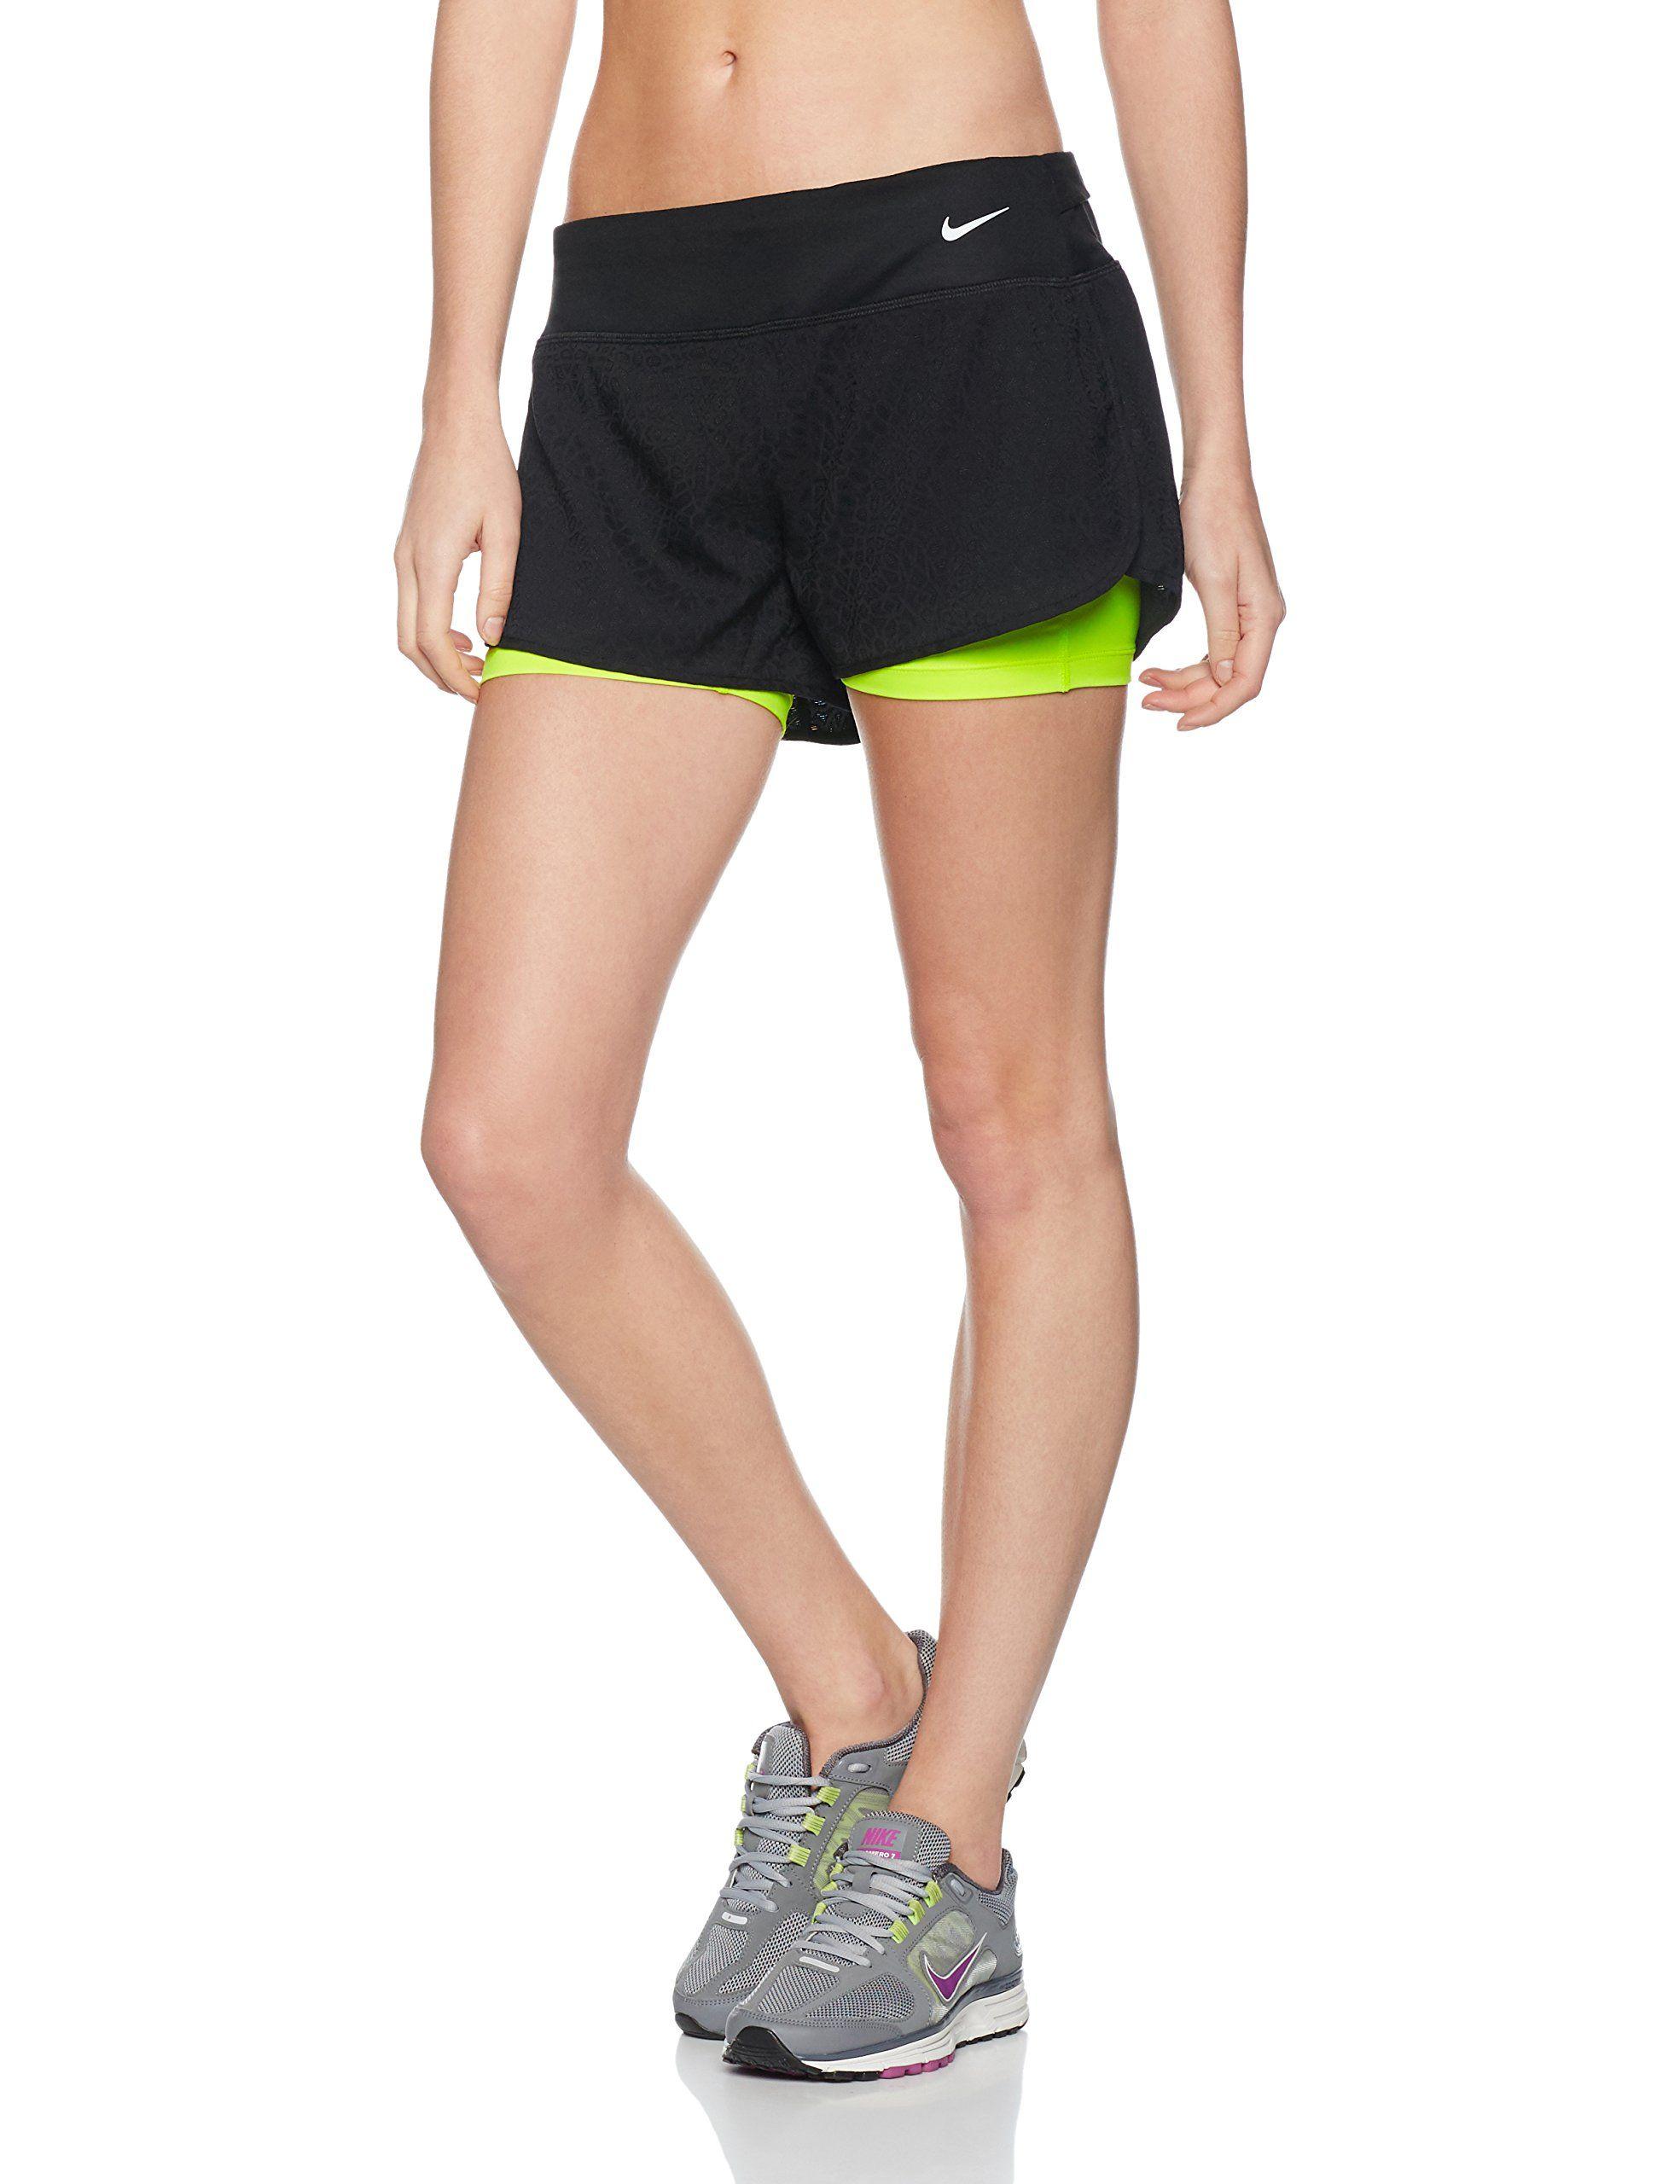 Nike 2in1 3 rival jacquard black womens running shorts